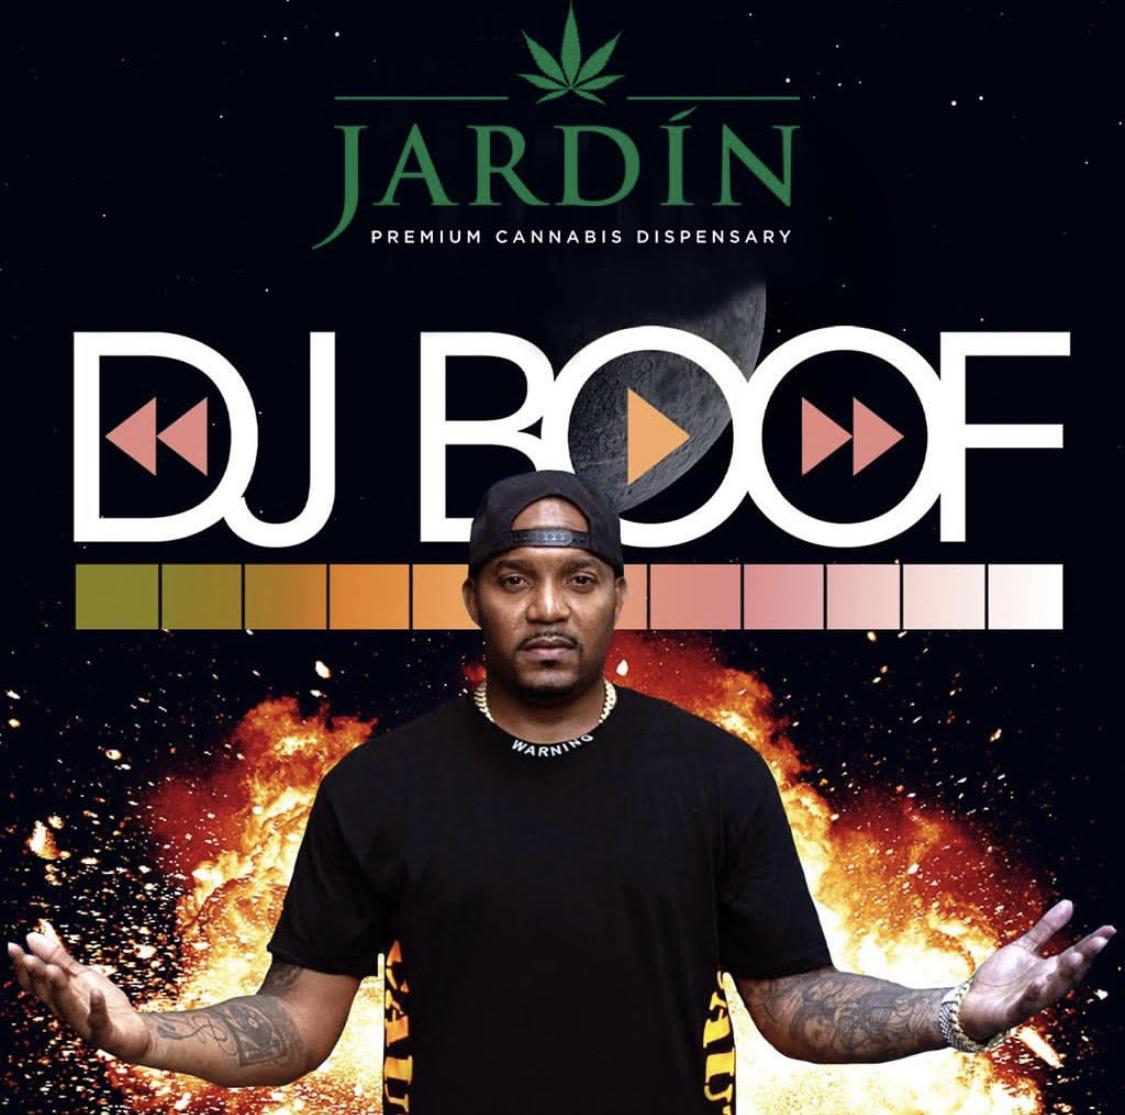 DJ BOOF COLLAB WITH JARDIN -